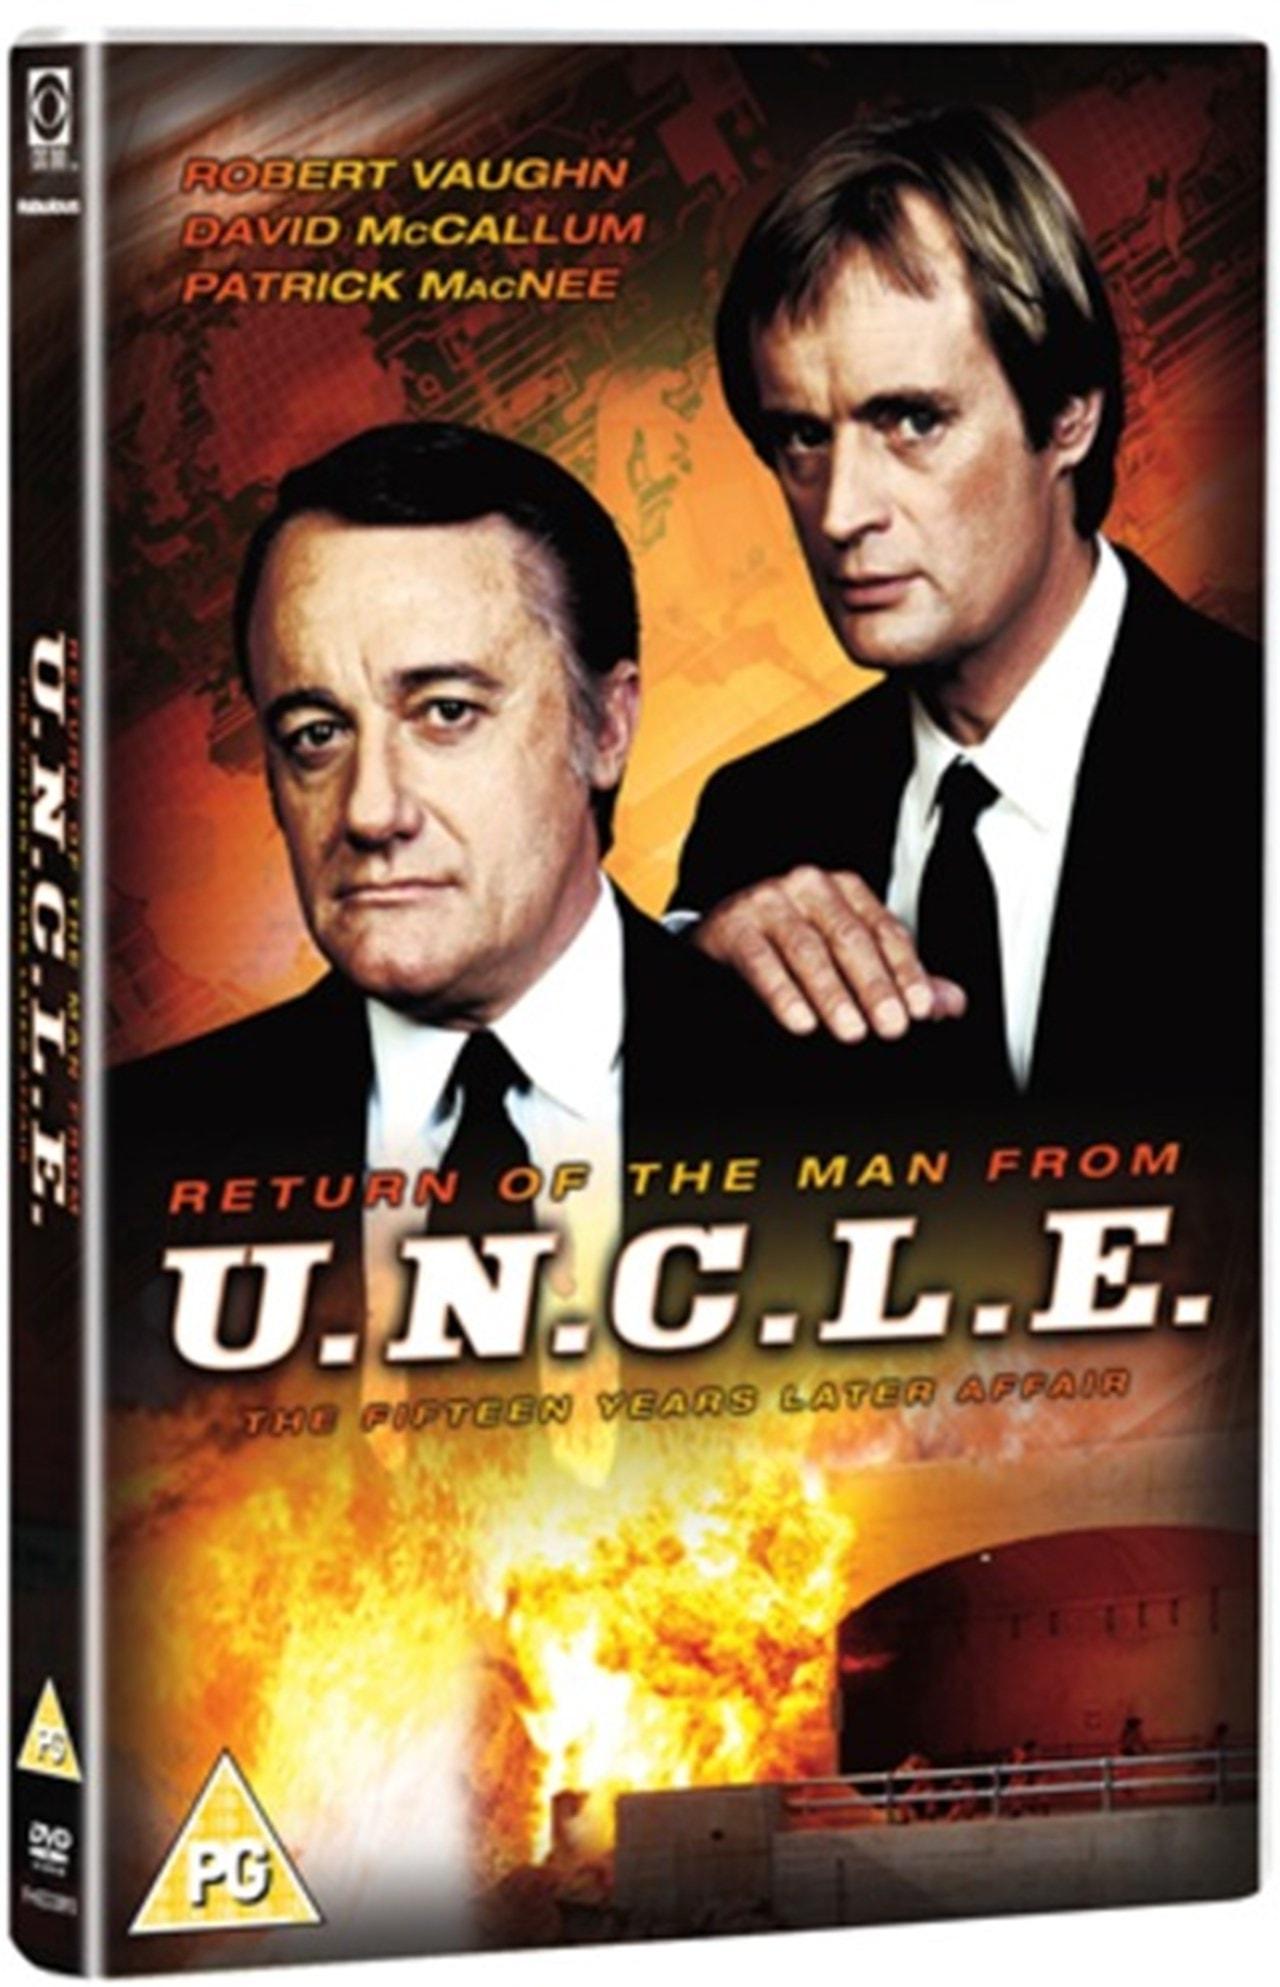 Return of the Man from U.N.C.L.E - 1